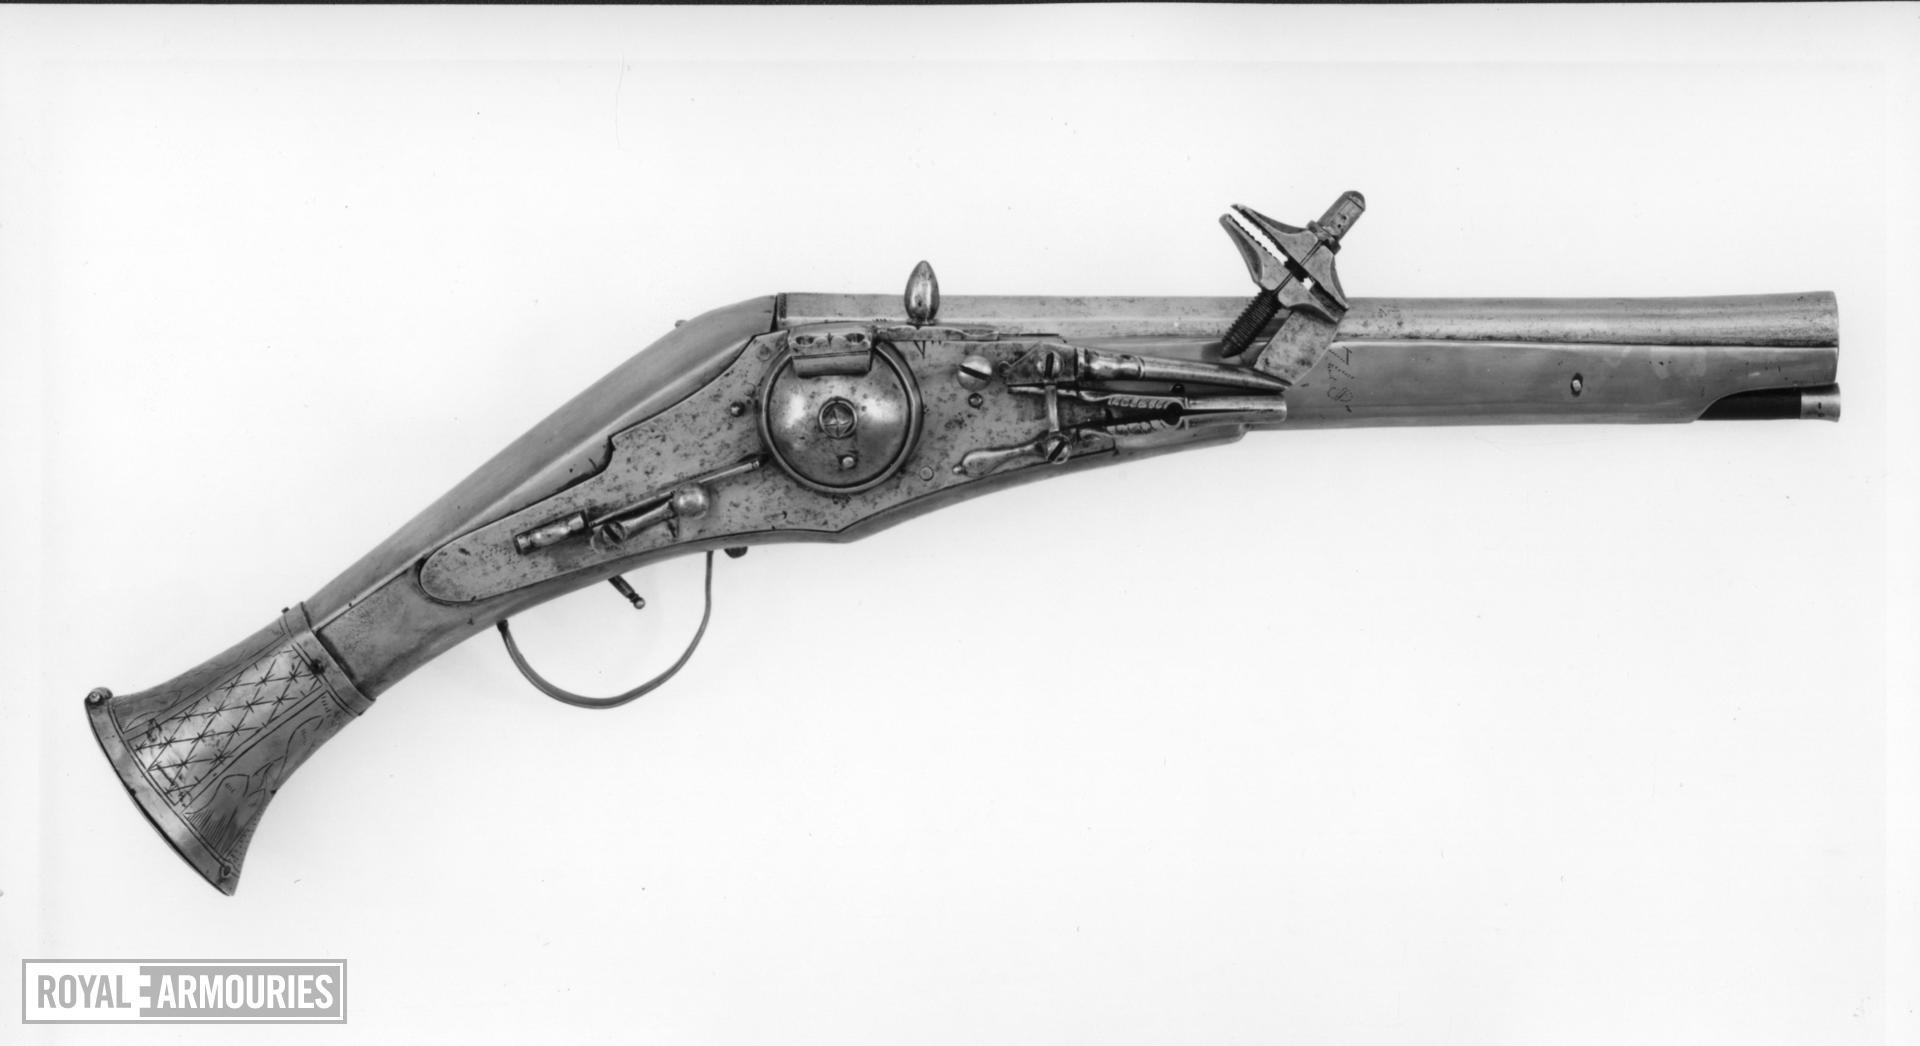 Wheellock holster pistol For the guard of Duke Julius of Brunswick-Wolfenb³ttel (1528-1589)